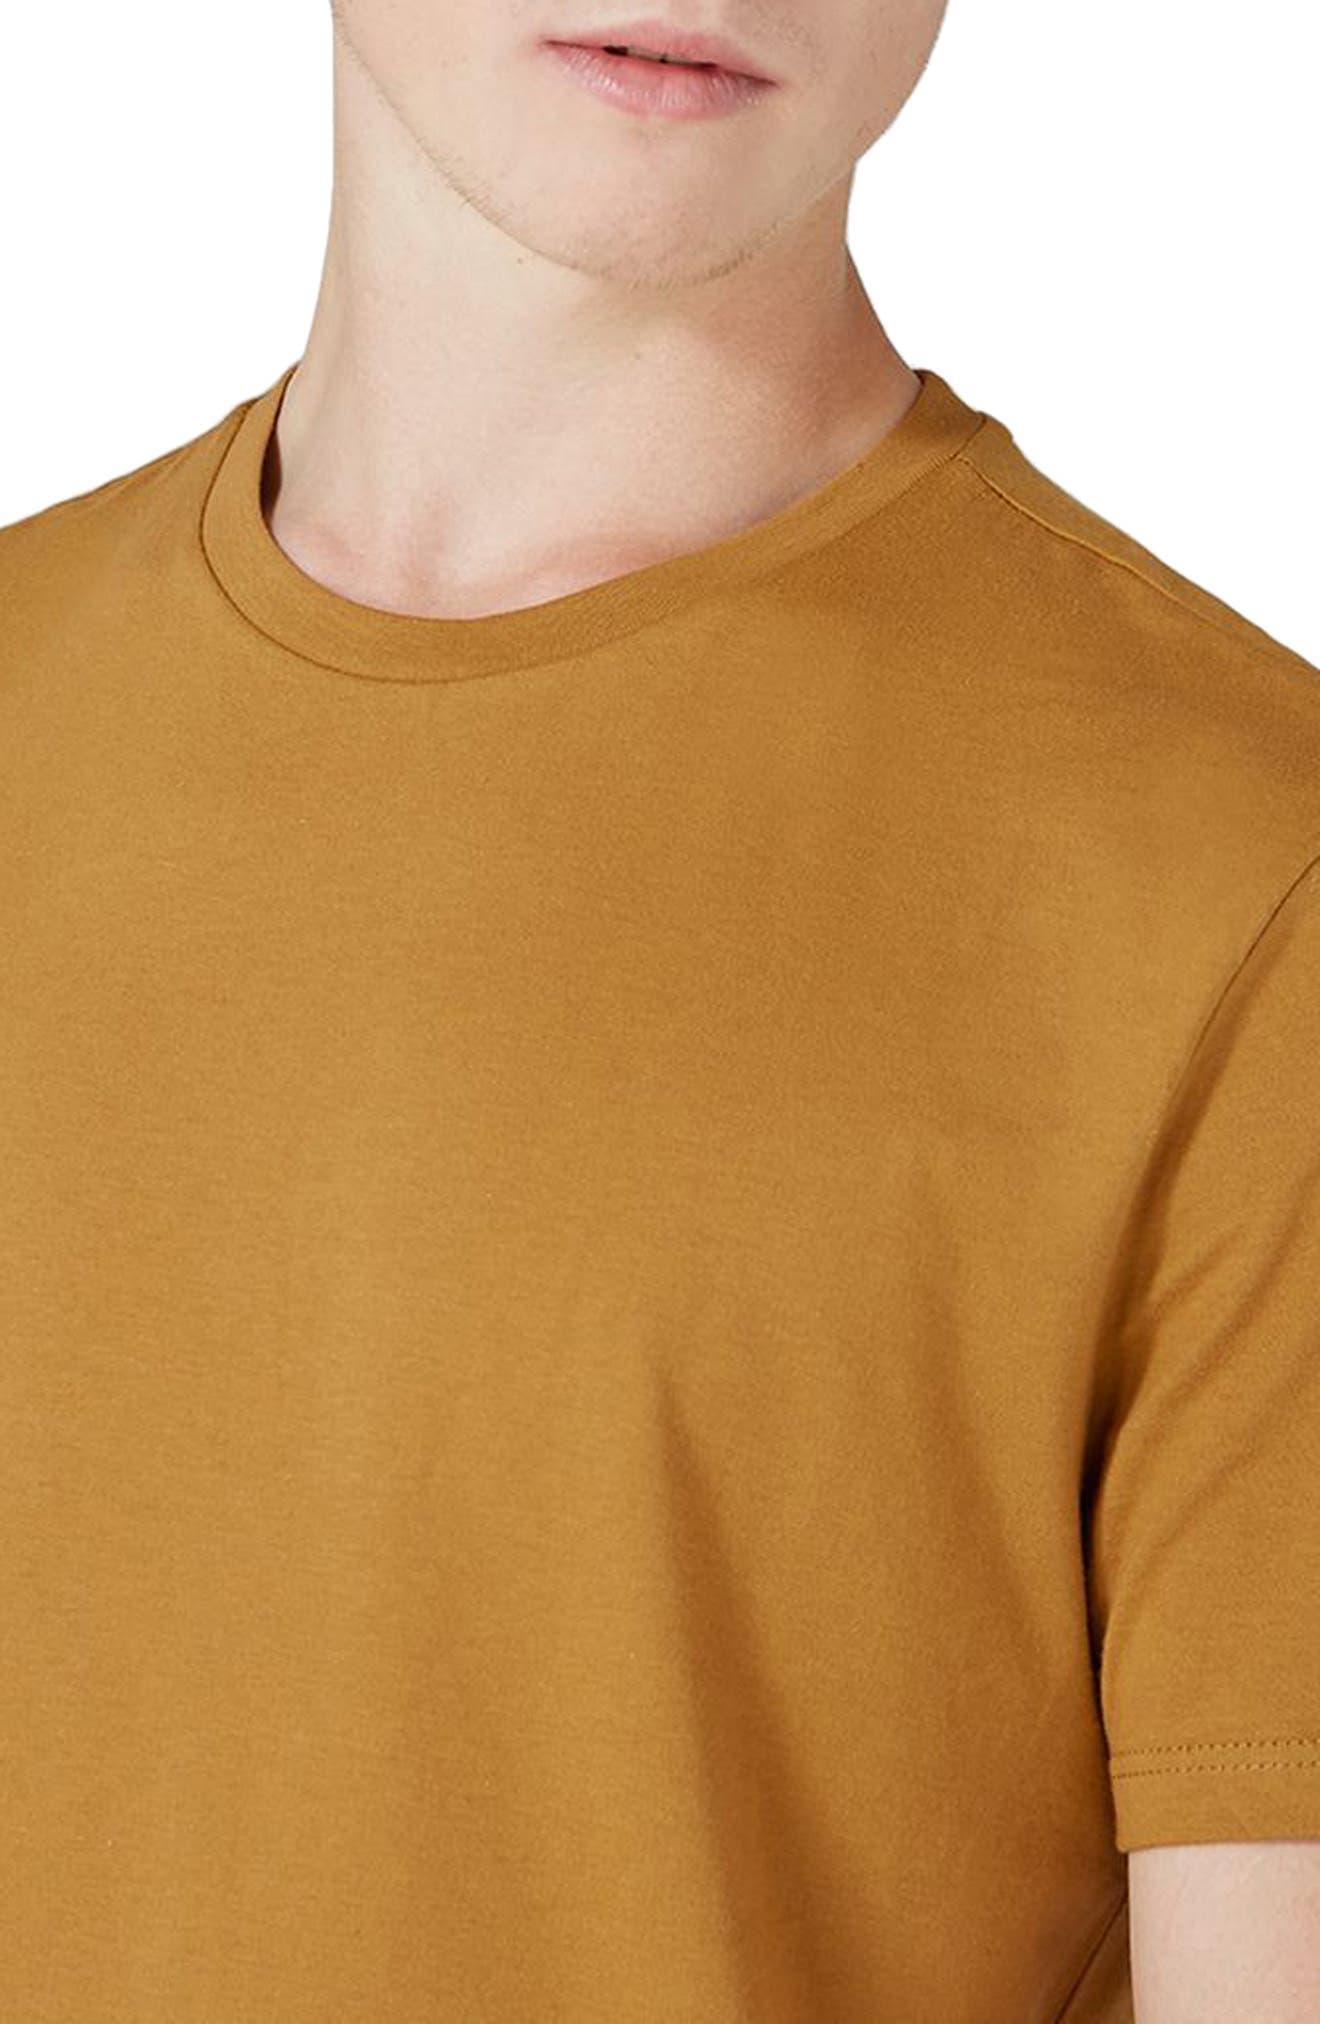 TOPMAN,                             Slim Fit Crewneck T-Shirt,                             Alternate thumbnail 3, color,                             701